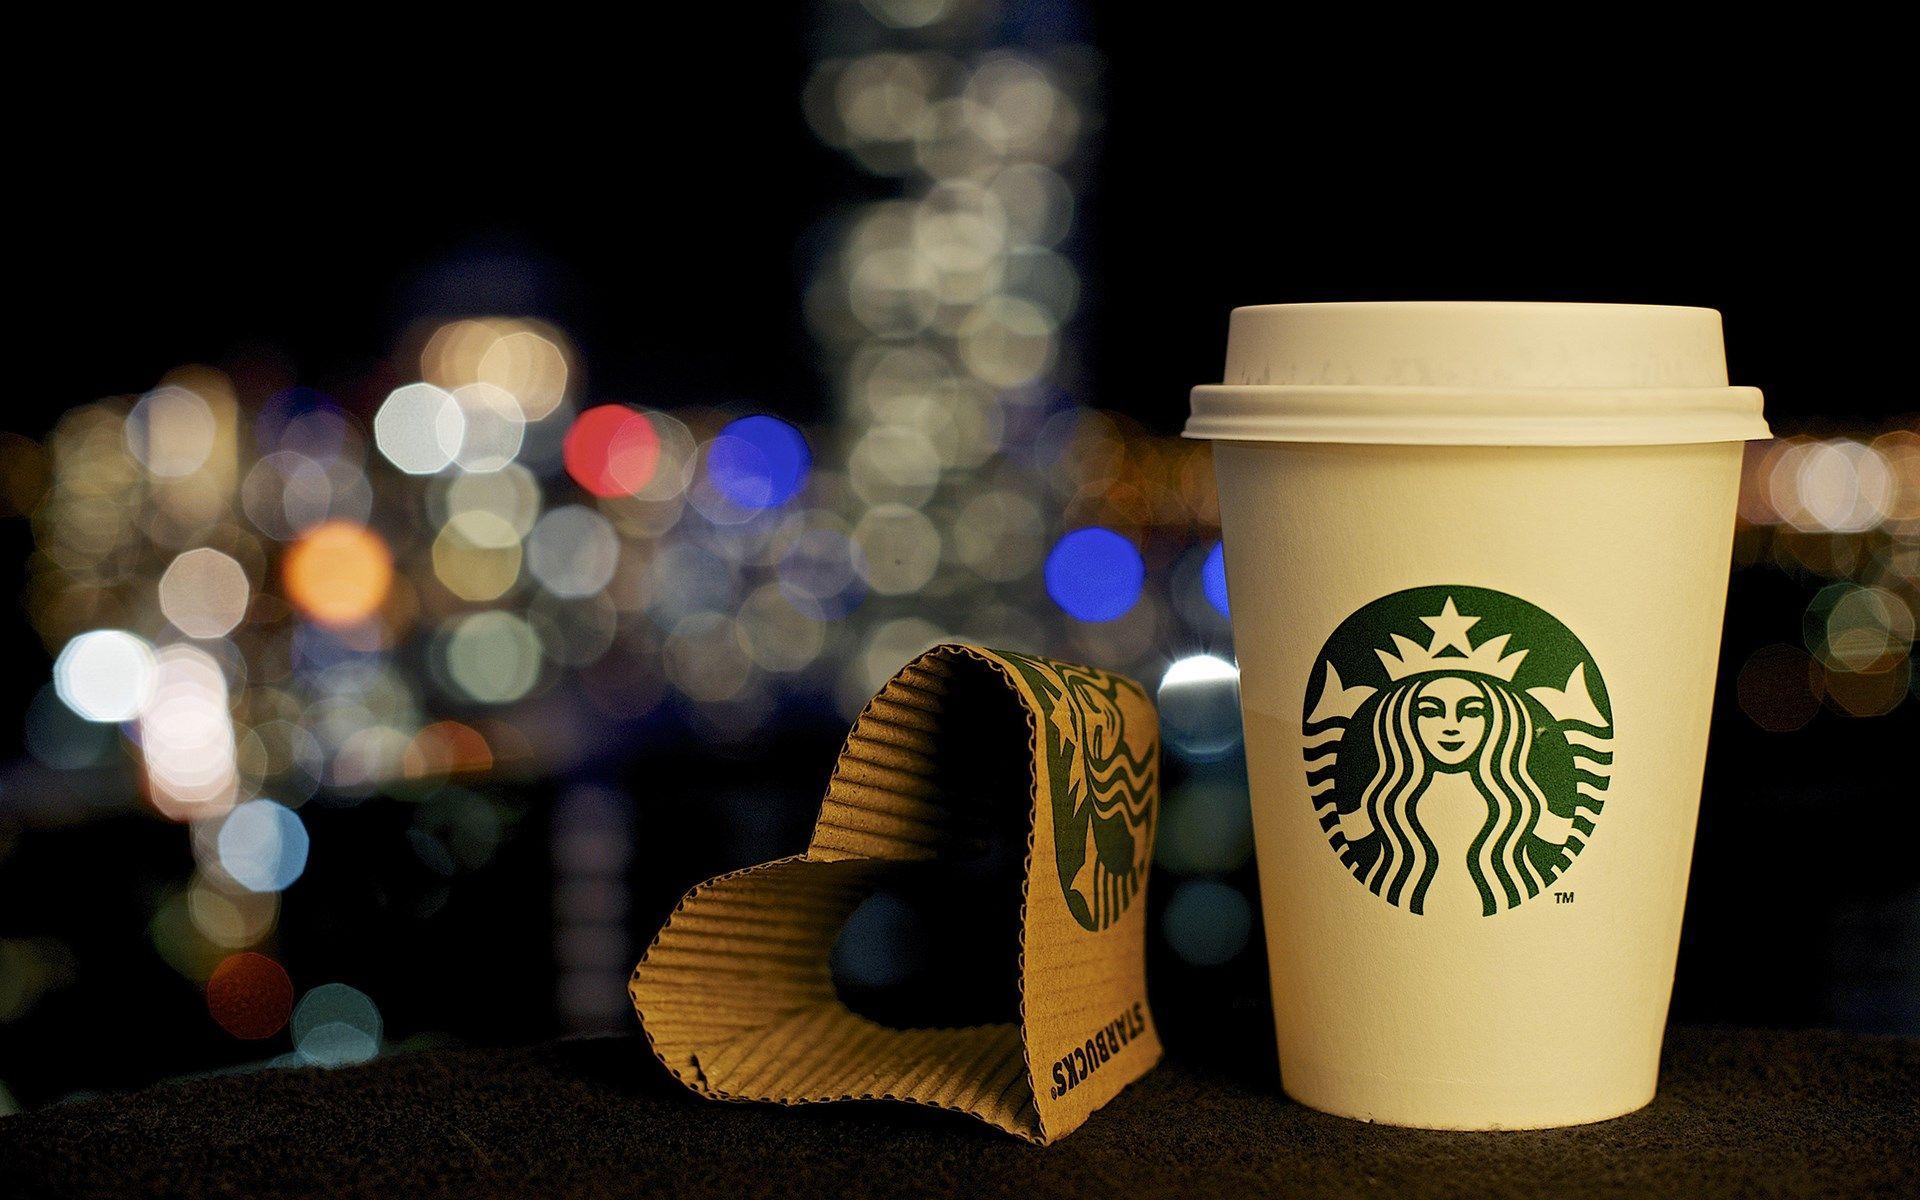 4 Iced Starbucks Drinks You Can Make At Home Starbucks